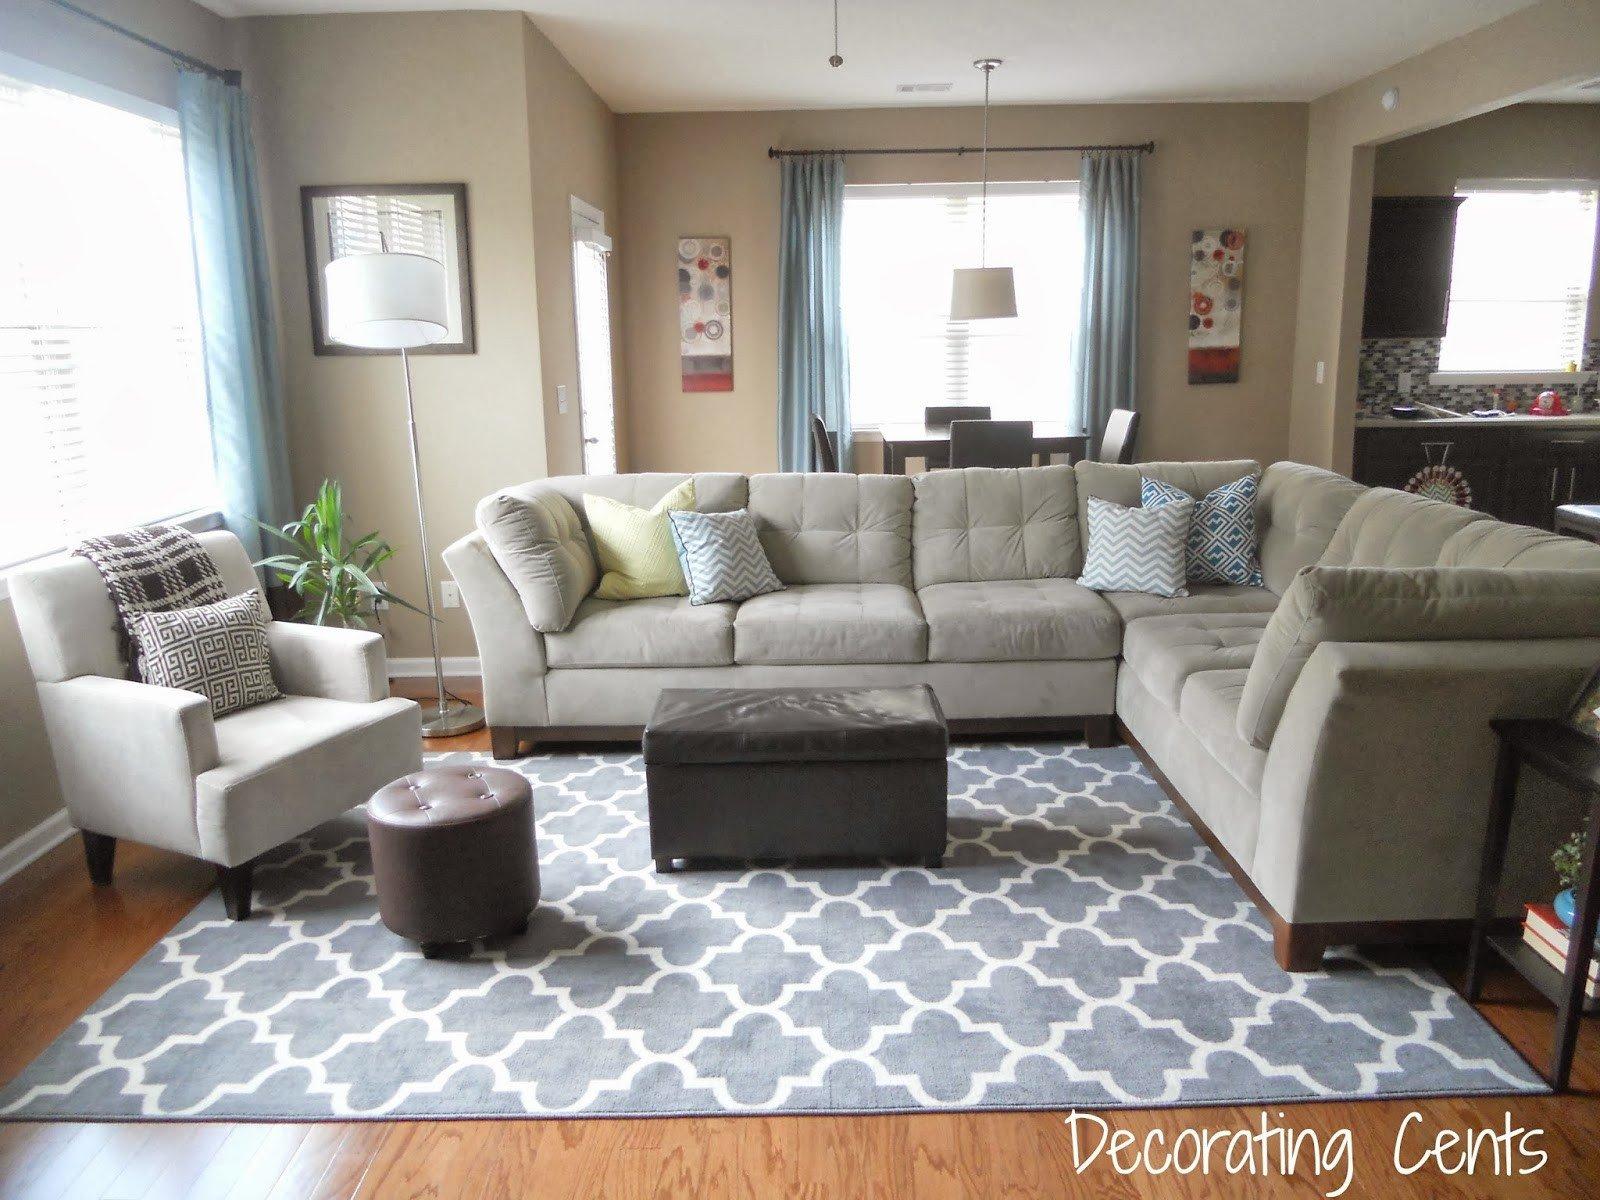 Rug for Living Room Ideas New Family Room Rug